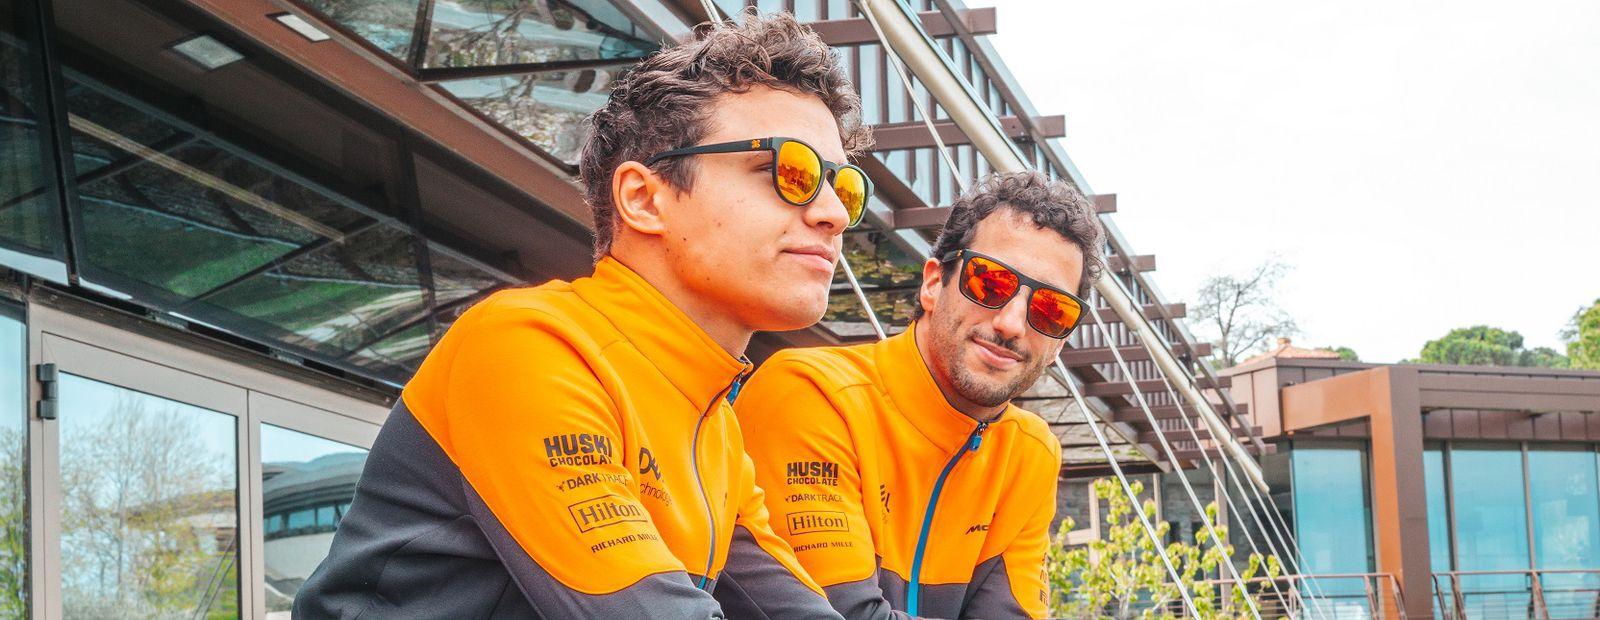 McLaren Racing announces new licensing partnership with top performance eyewear brand, SunGod